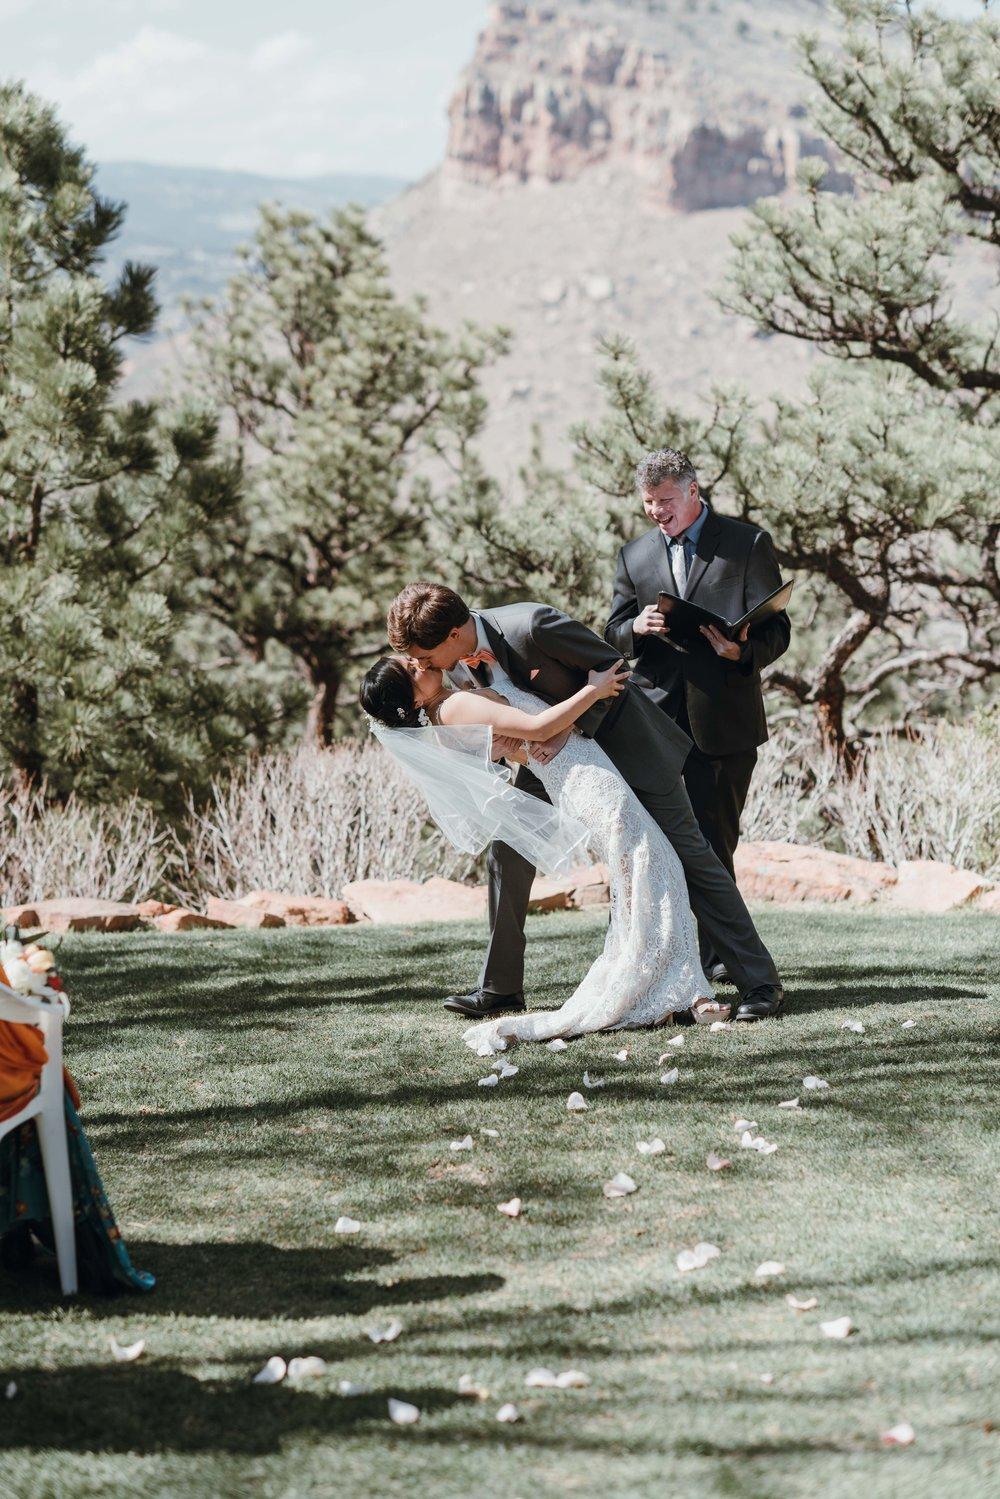 denver wedding photographer lioncrest manor in lyons ben and mali -DSC_1634.jpg